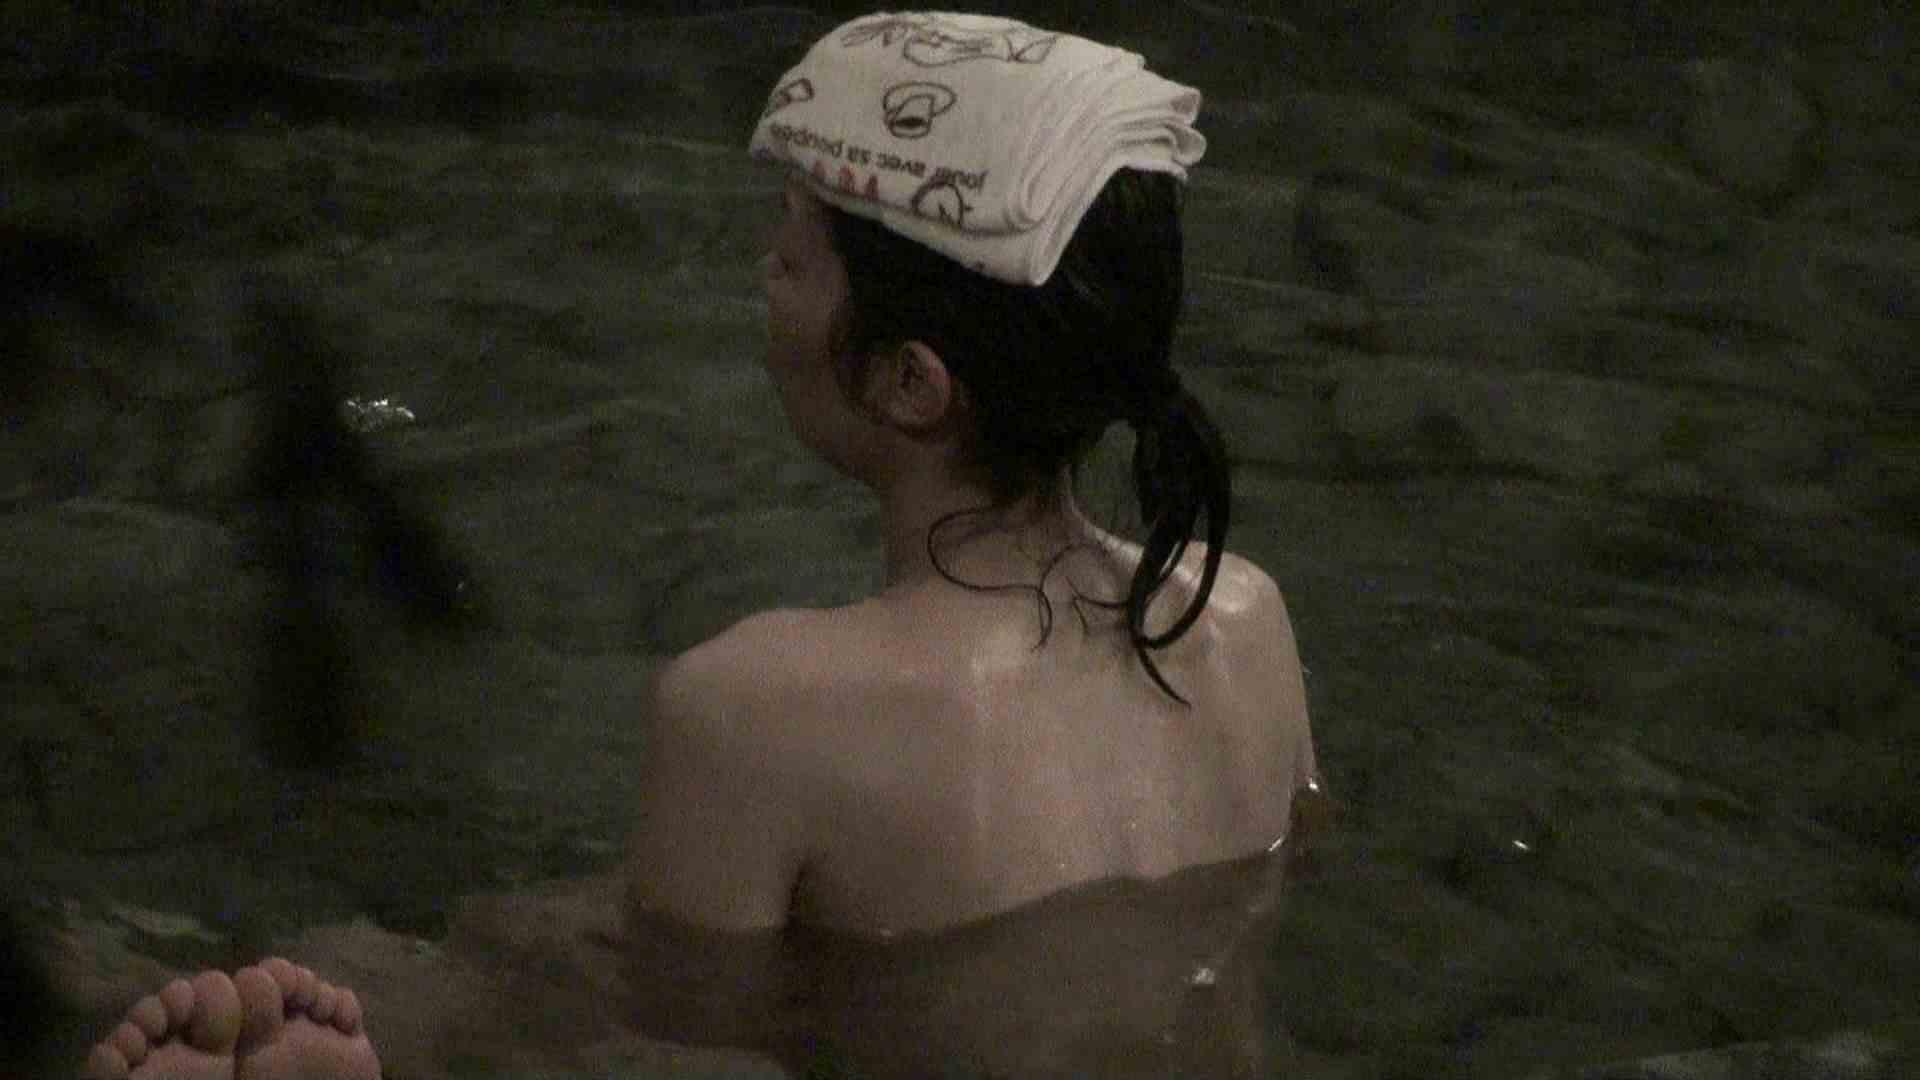 Aquaな露天風呂Vol.399 盗撮 | OLセックス  67画像 34